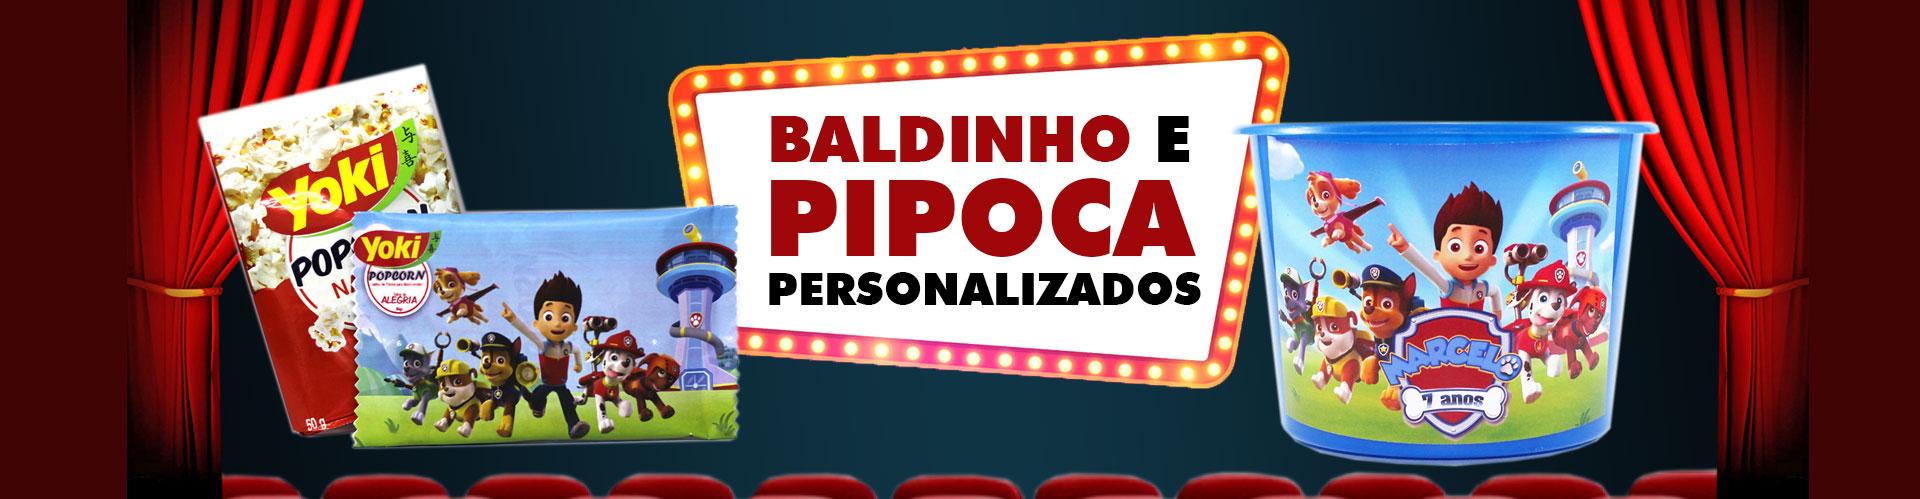 Banner Baldinho de pipoca